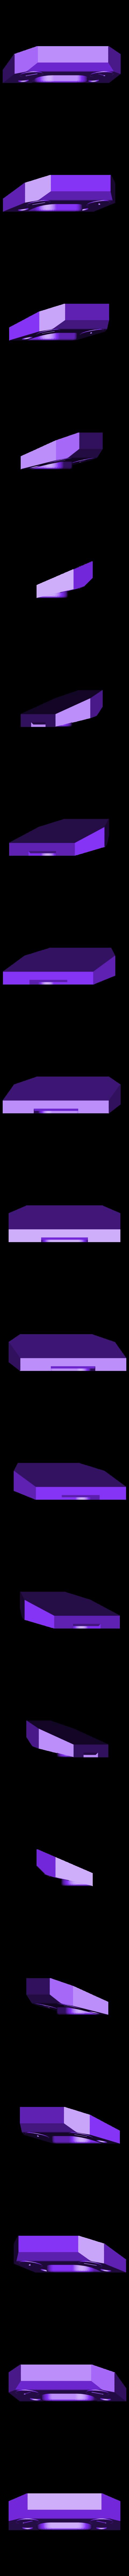 top lockplate.stl Download free STL file Fortnite Chest  • 3D print template, blecheimer